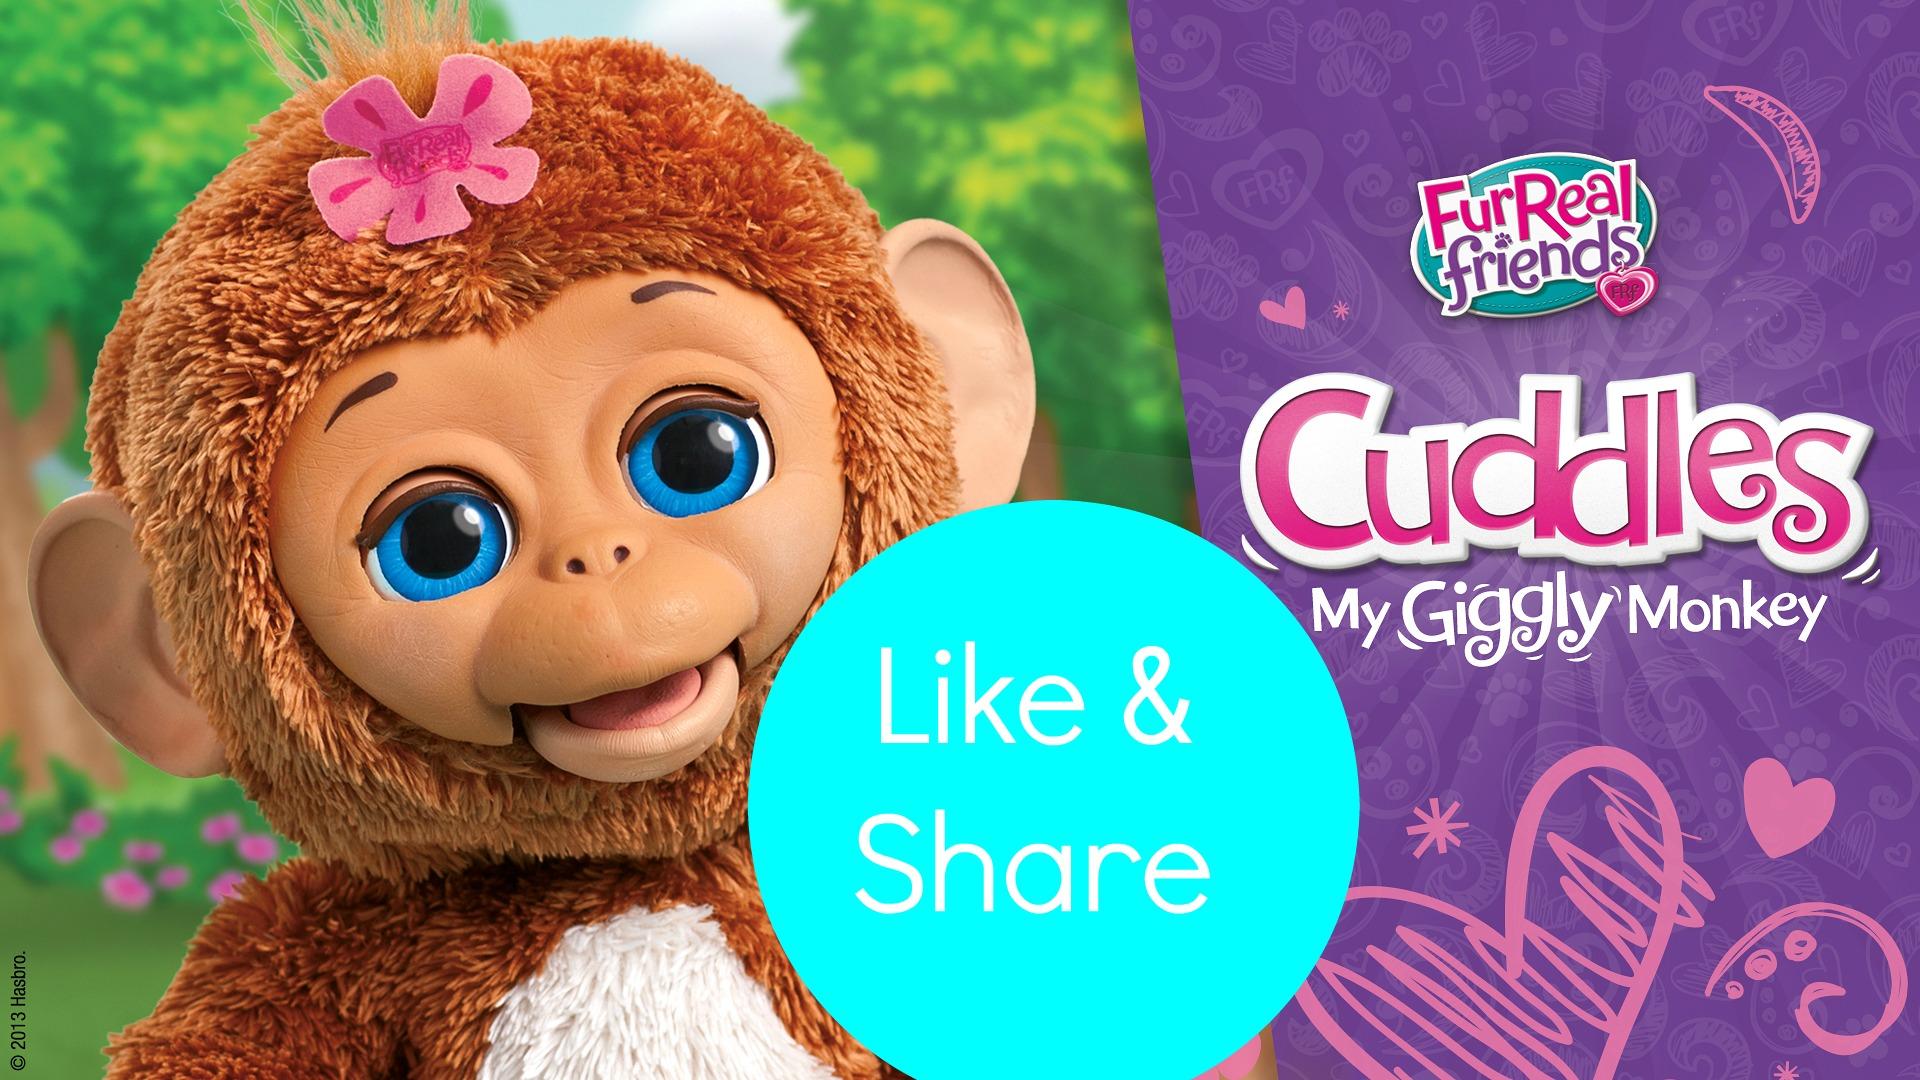 Baby Cuddles-FurReal Friends aapje Koko-winactie-GoodGirlsCompany